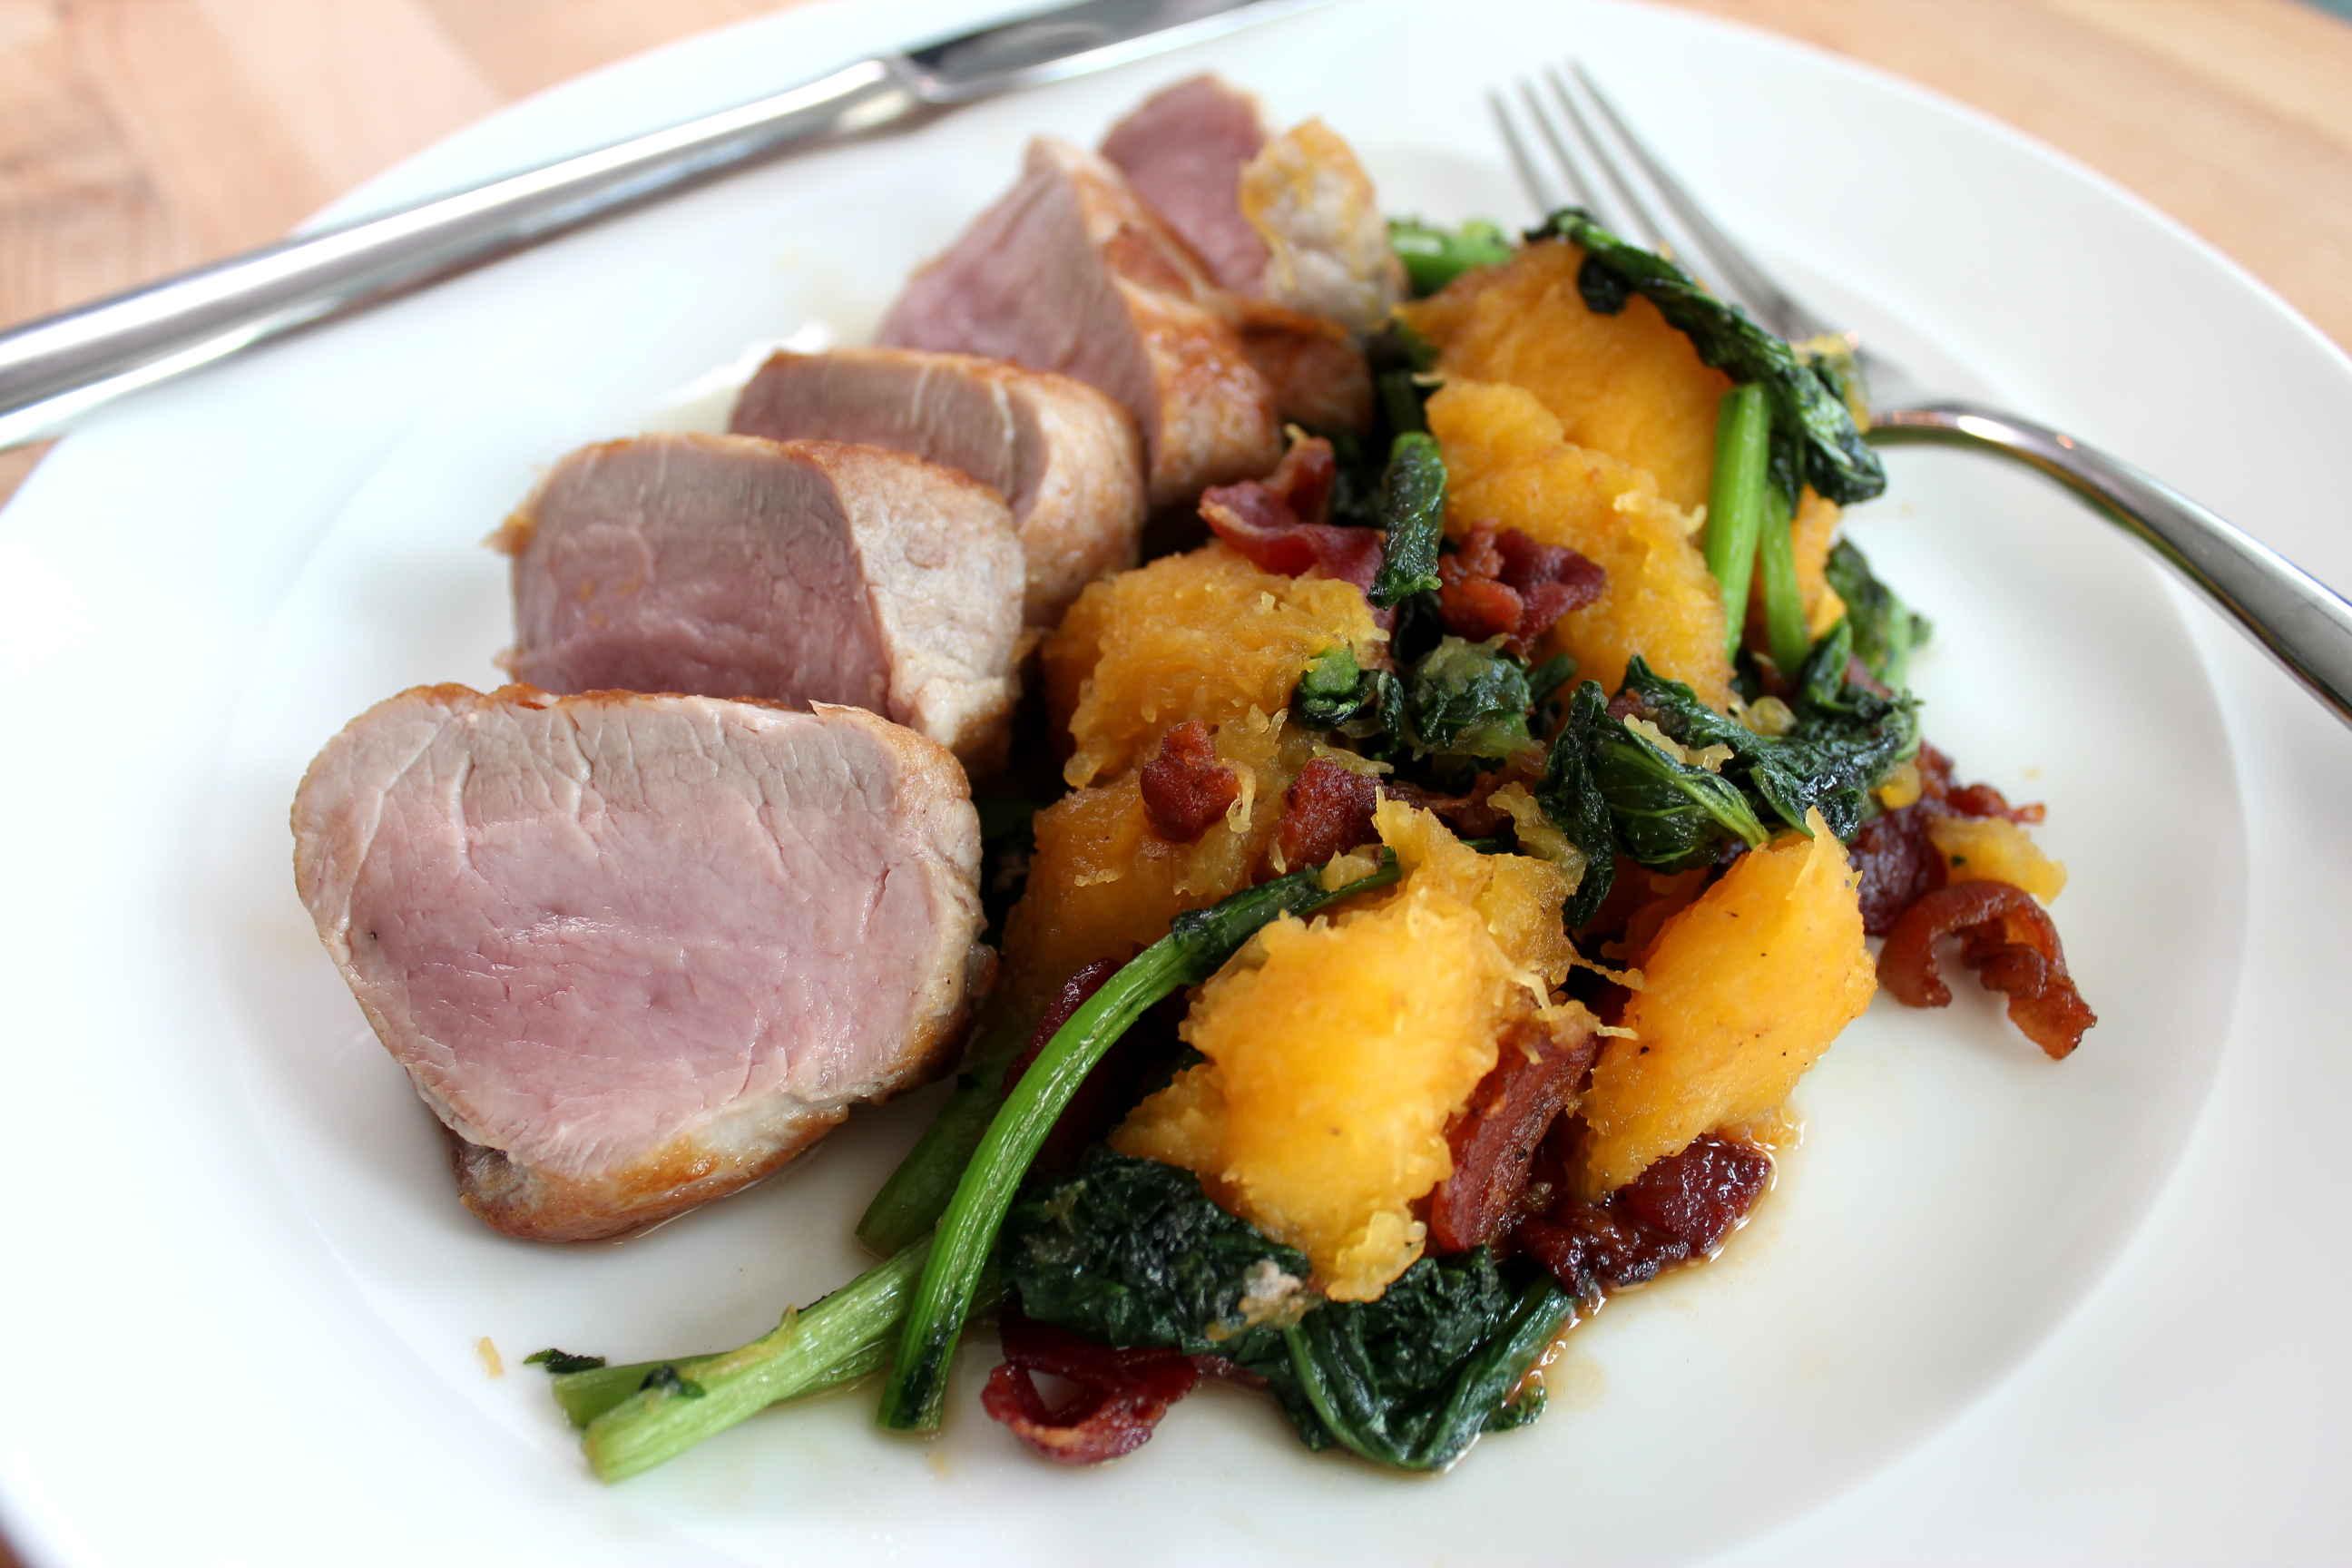 Pork_tenderloin_plated